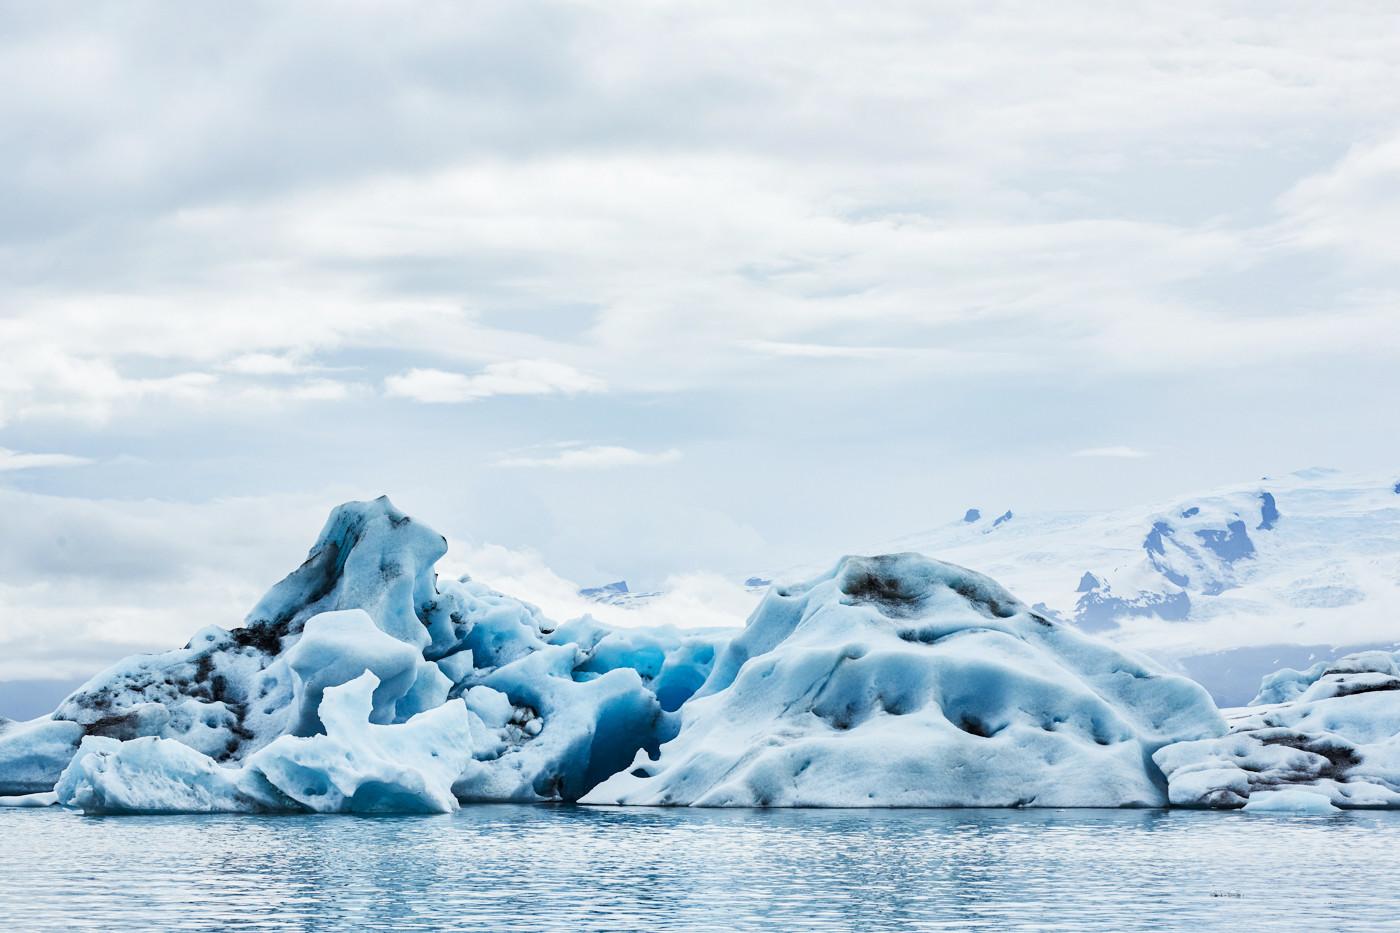 Bootstour auf dem Jökulsárlón Gletschersee, Eissee, Ice lake, Ice lagoon, Boat tour on the glacier lake, Iceland, famous, Island, Miles and Shores, Reiseblog, travelblog, ice, good weather